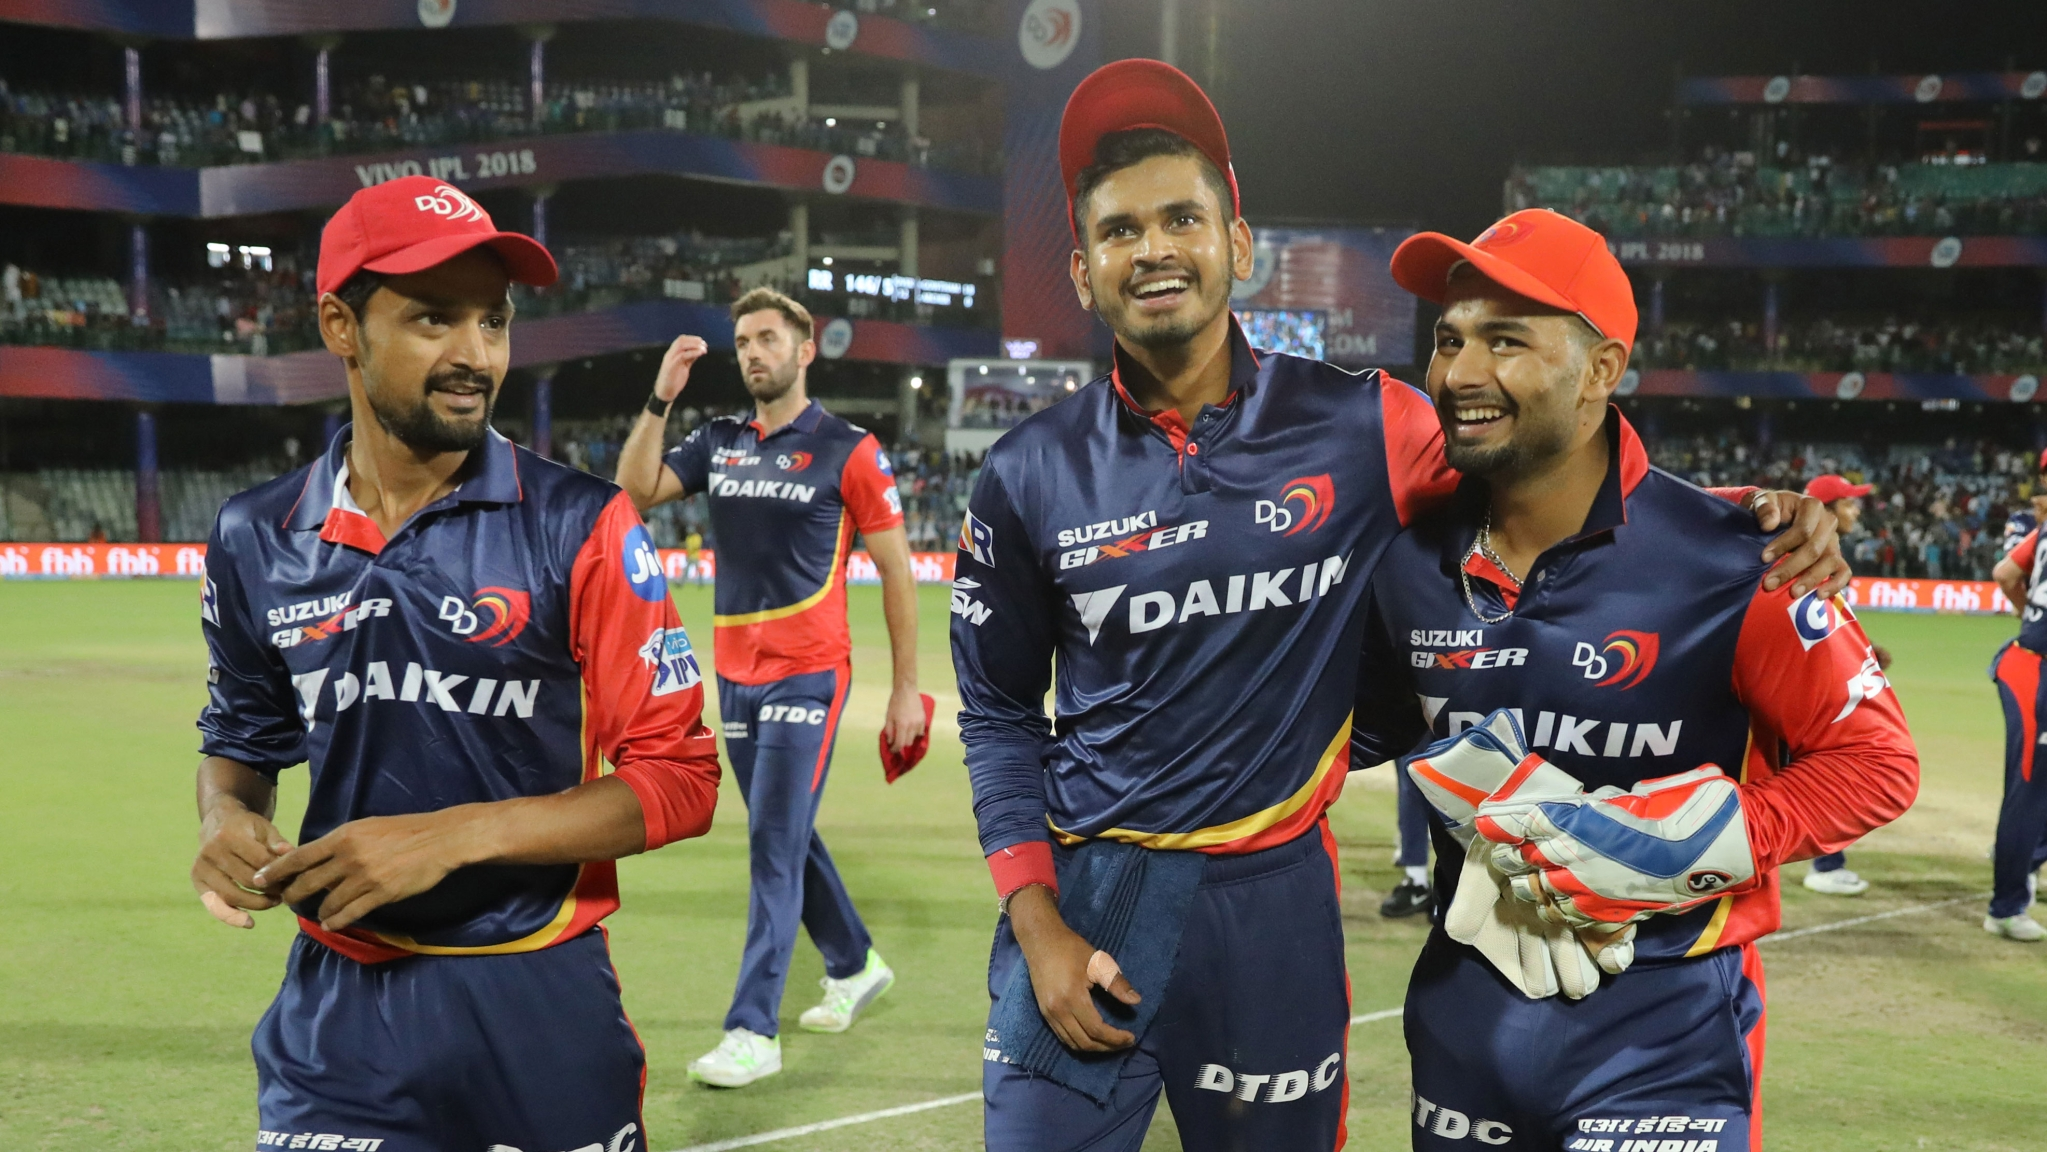 IPL 2018: Orange Cap, Purple Cap & a Win: Delhi Daredevils Have a Good Day vs Ra...